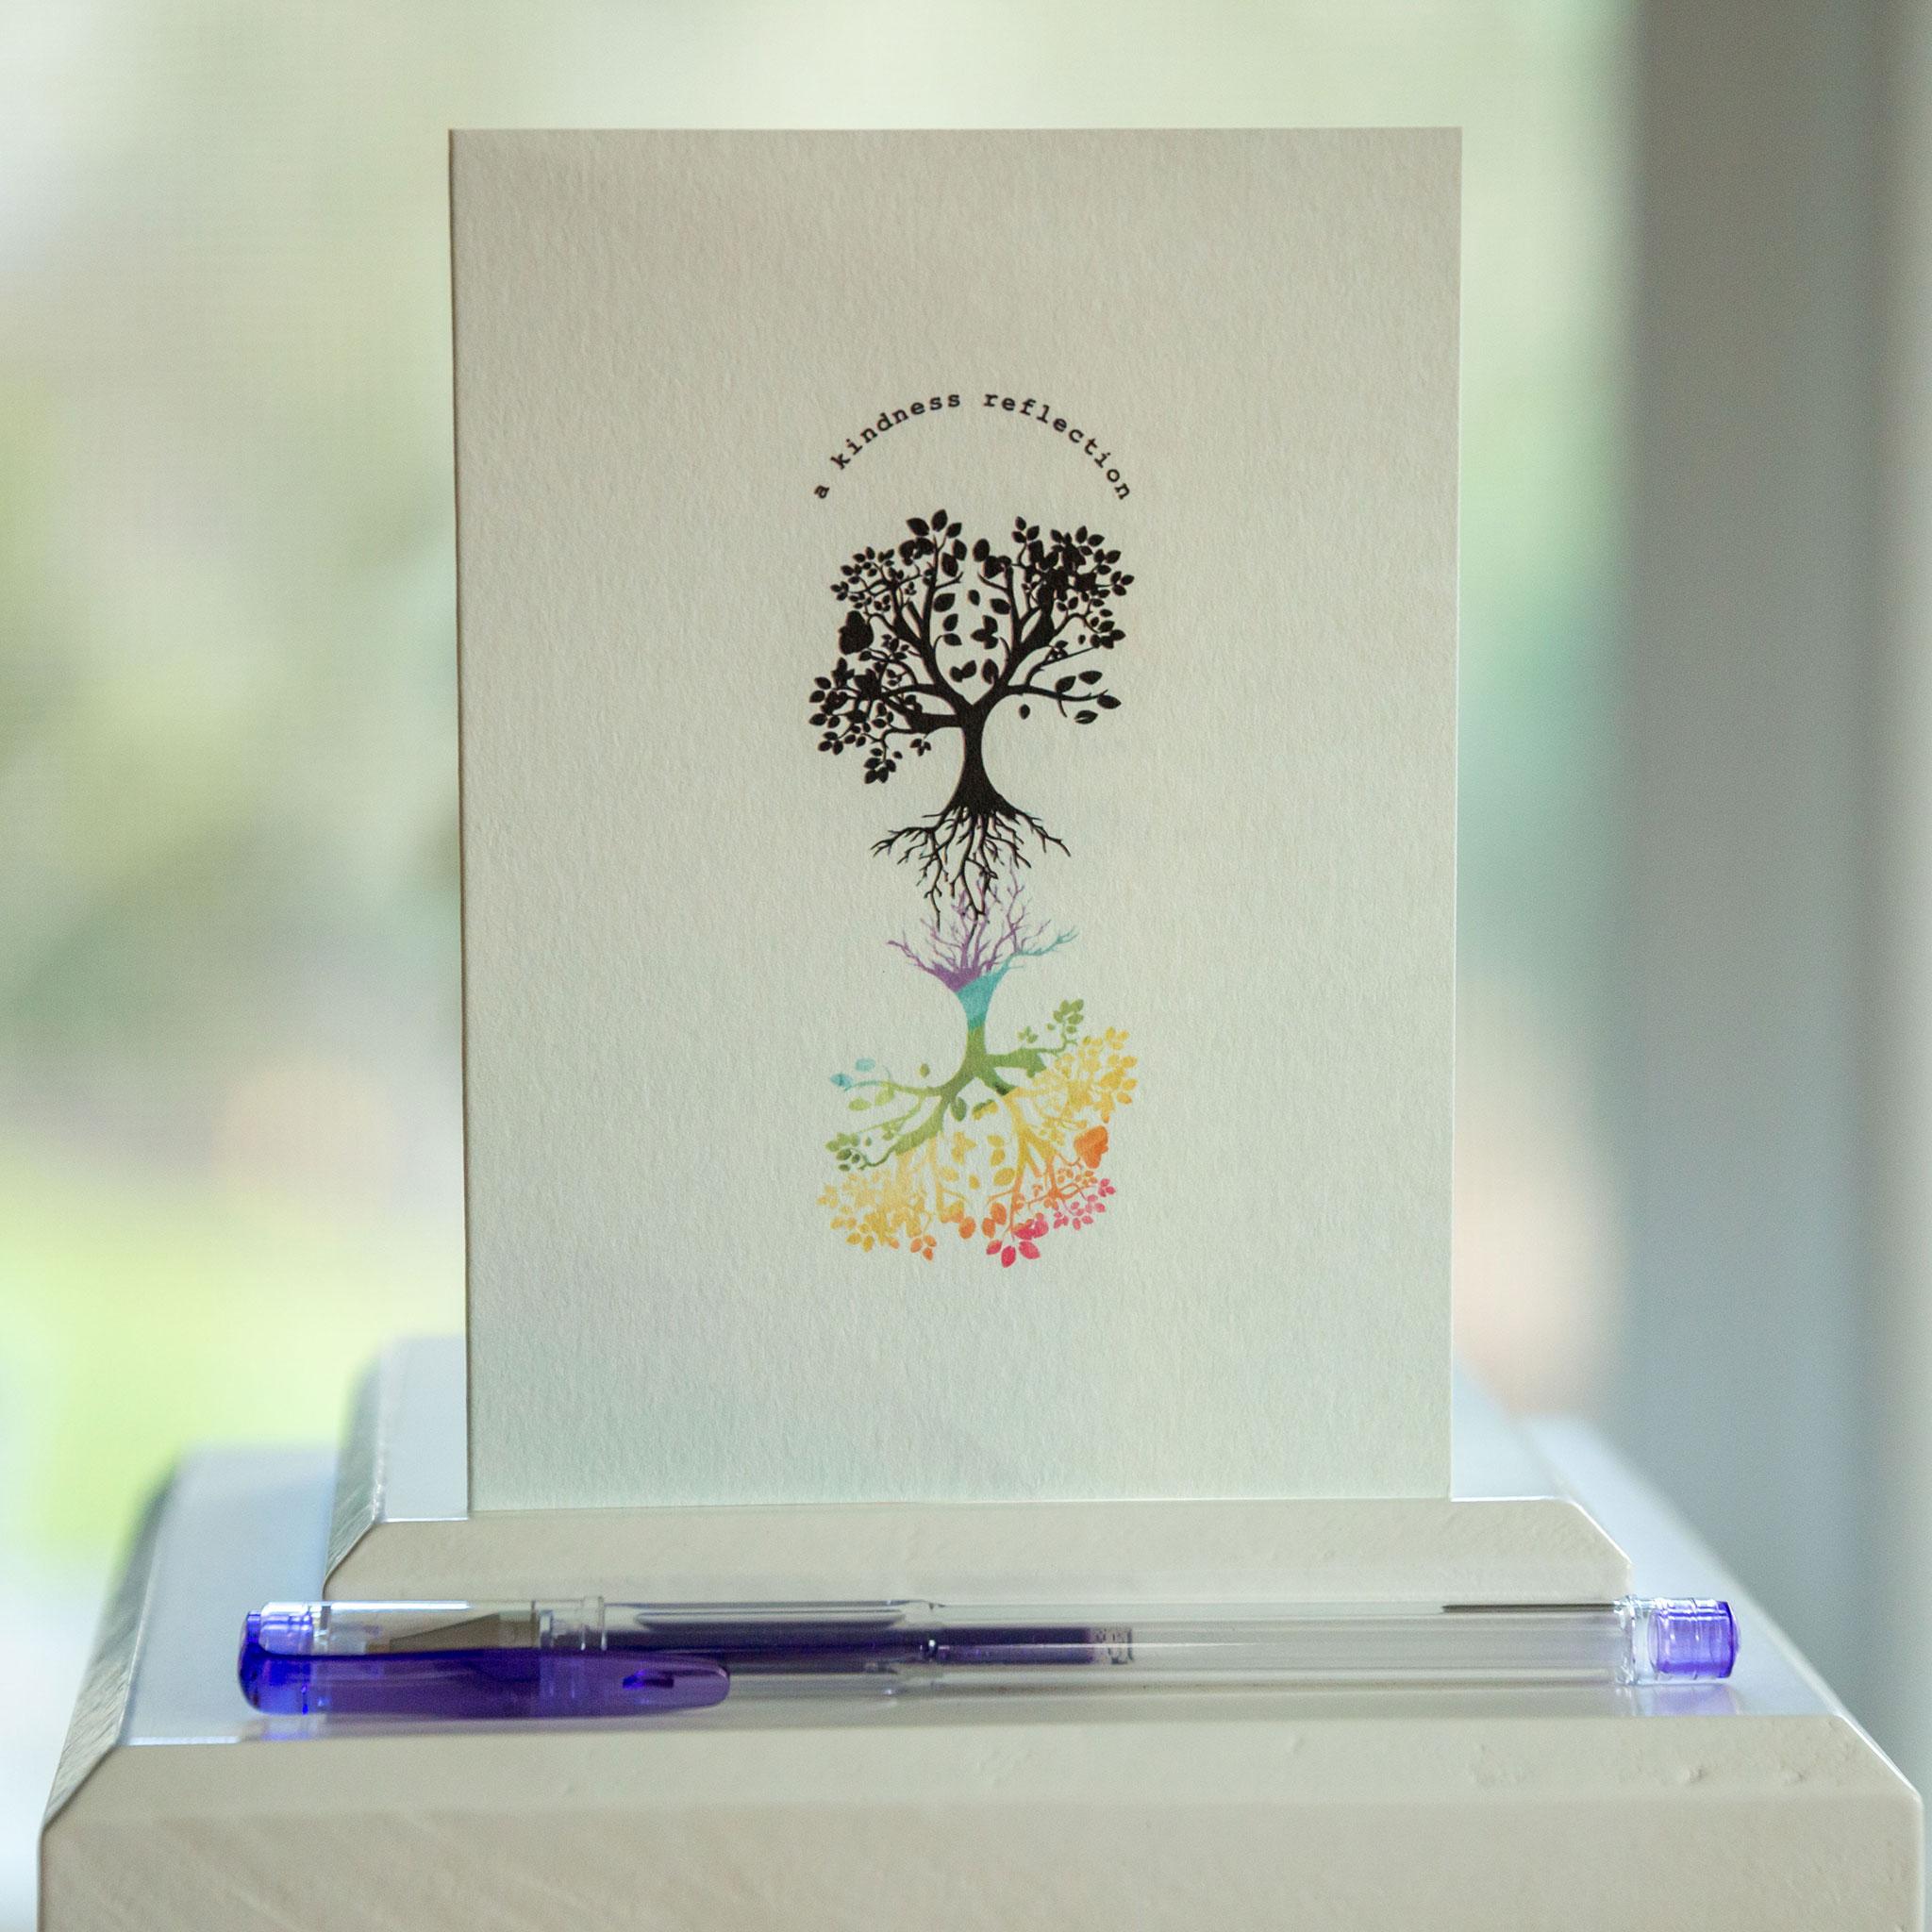 Tree with rainbow reflection on gratitude card